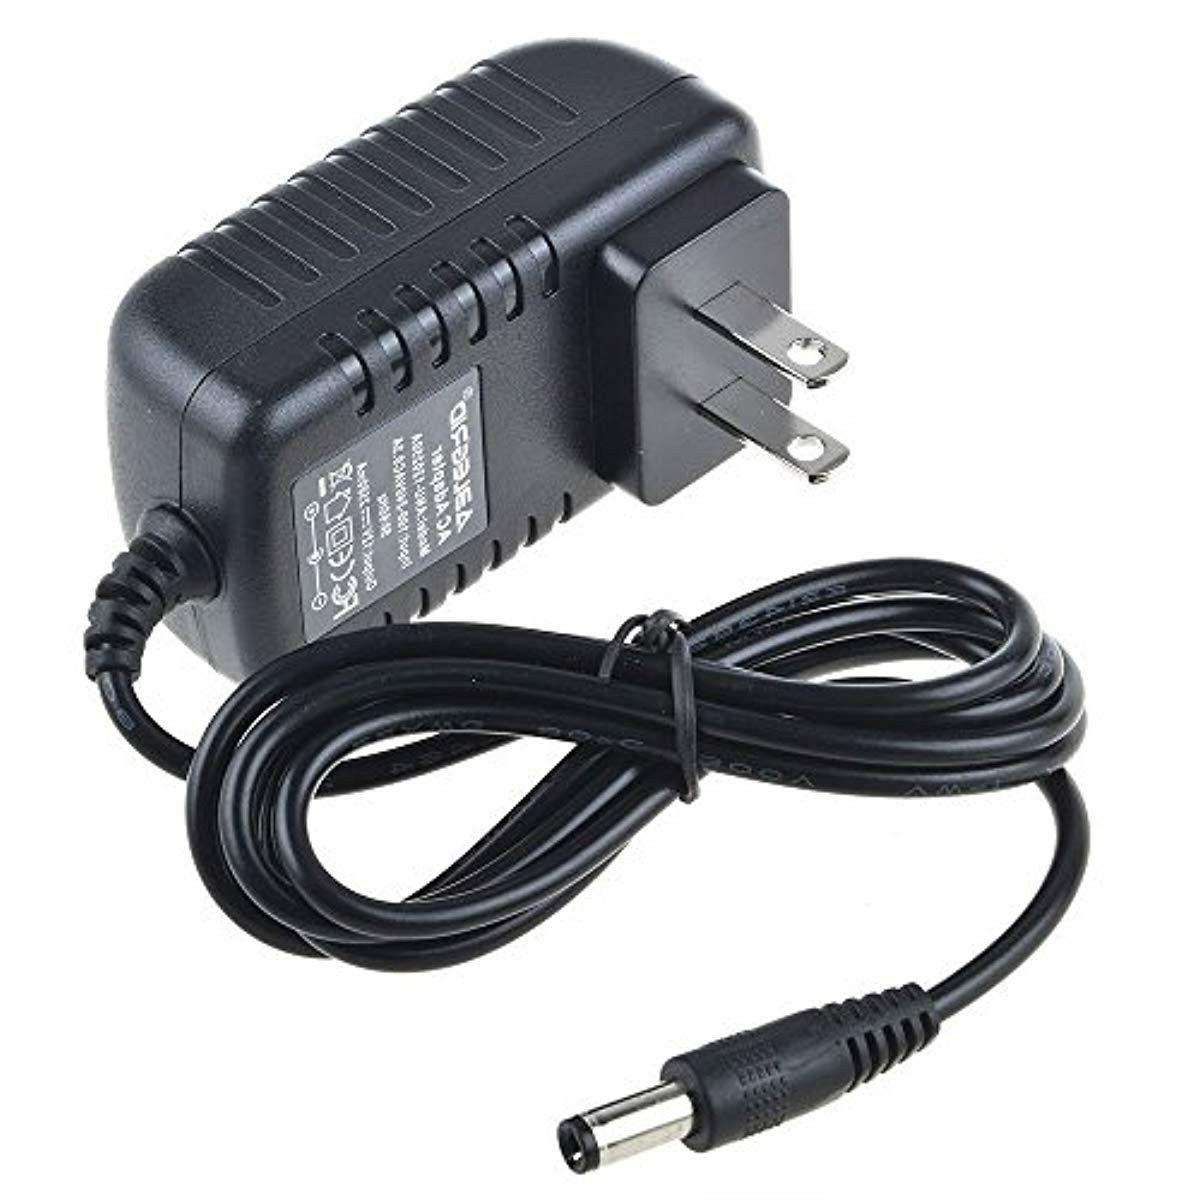 ABLEGRID Supply 2.5 Standard Adapter